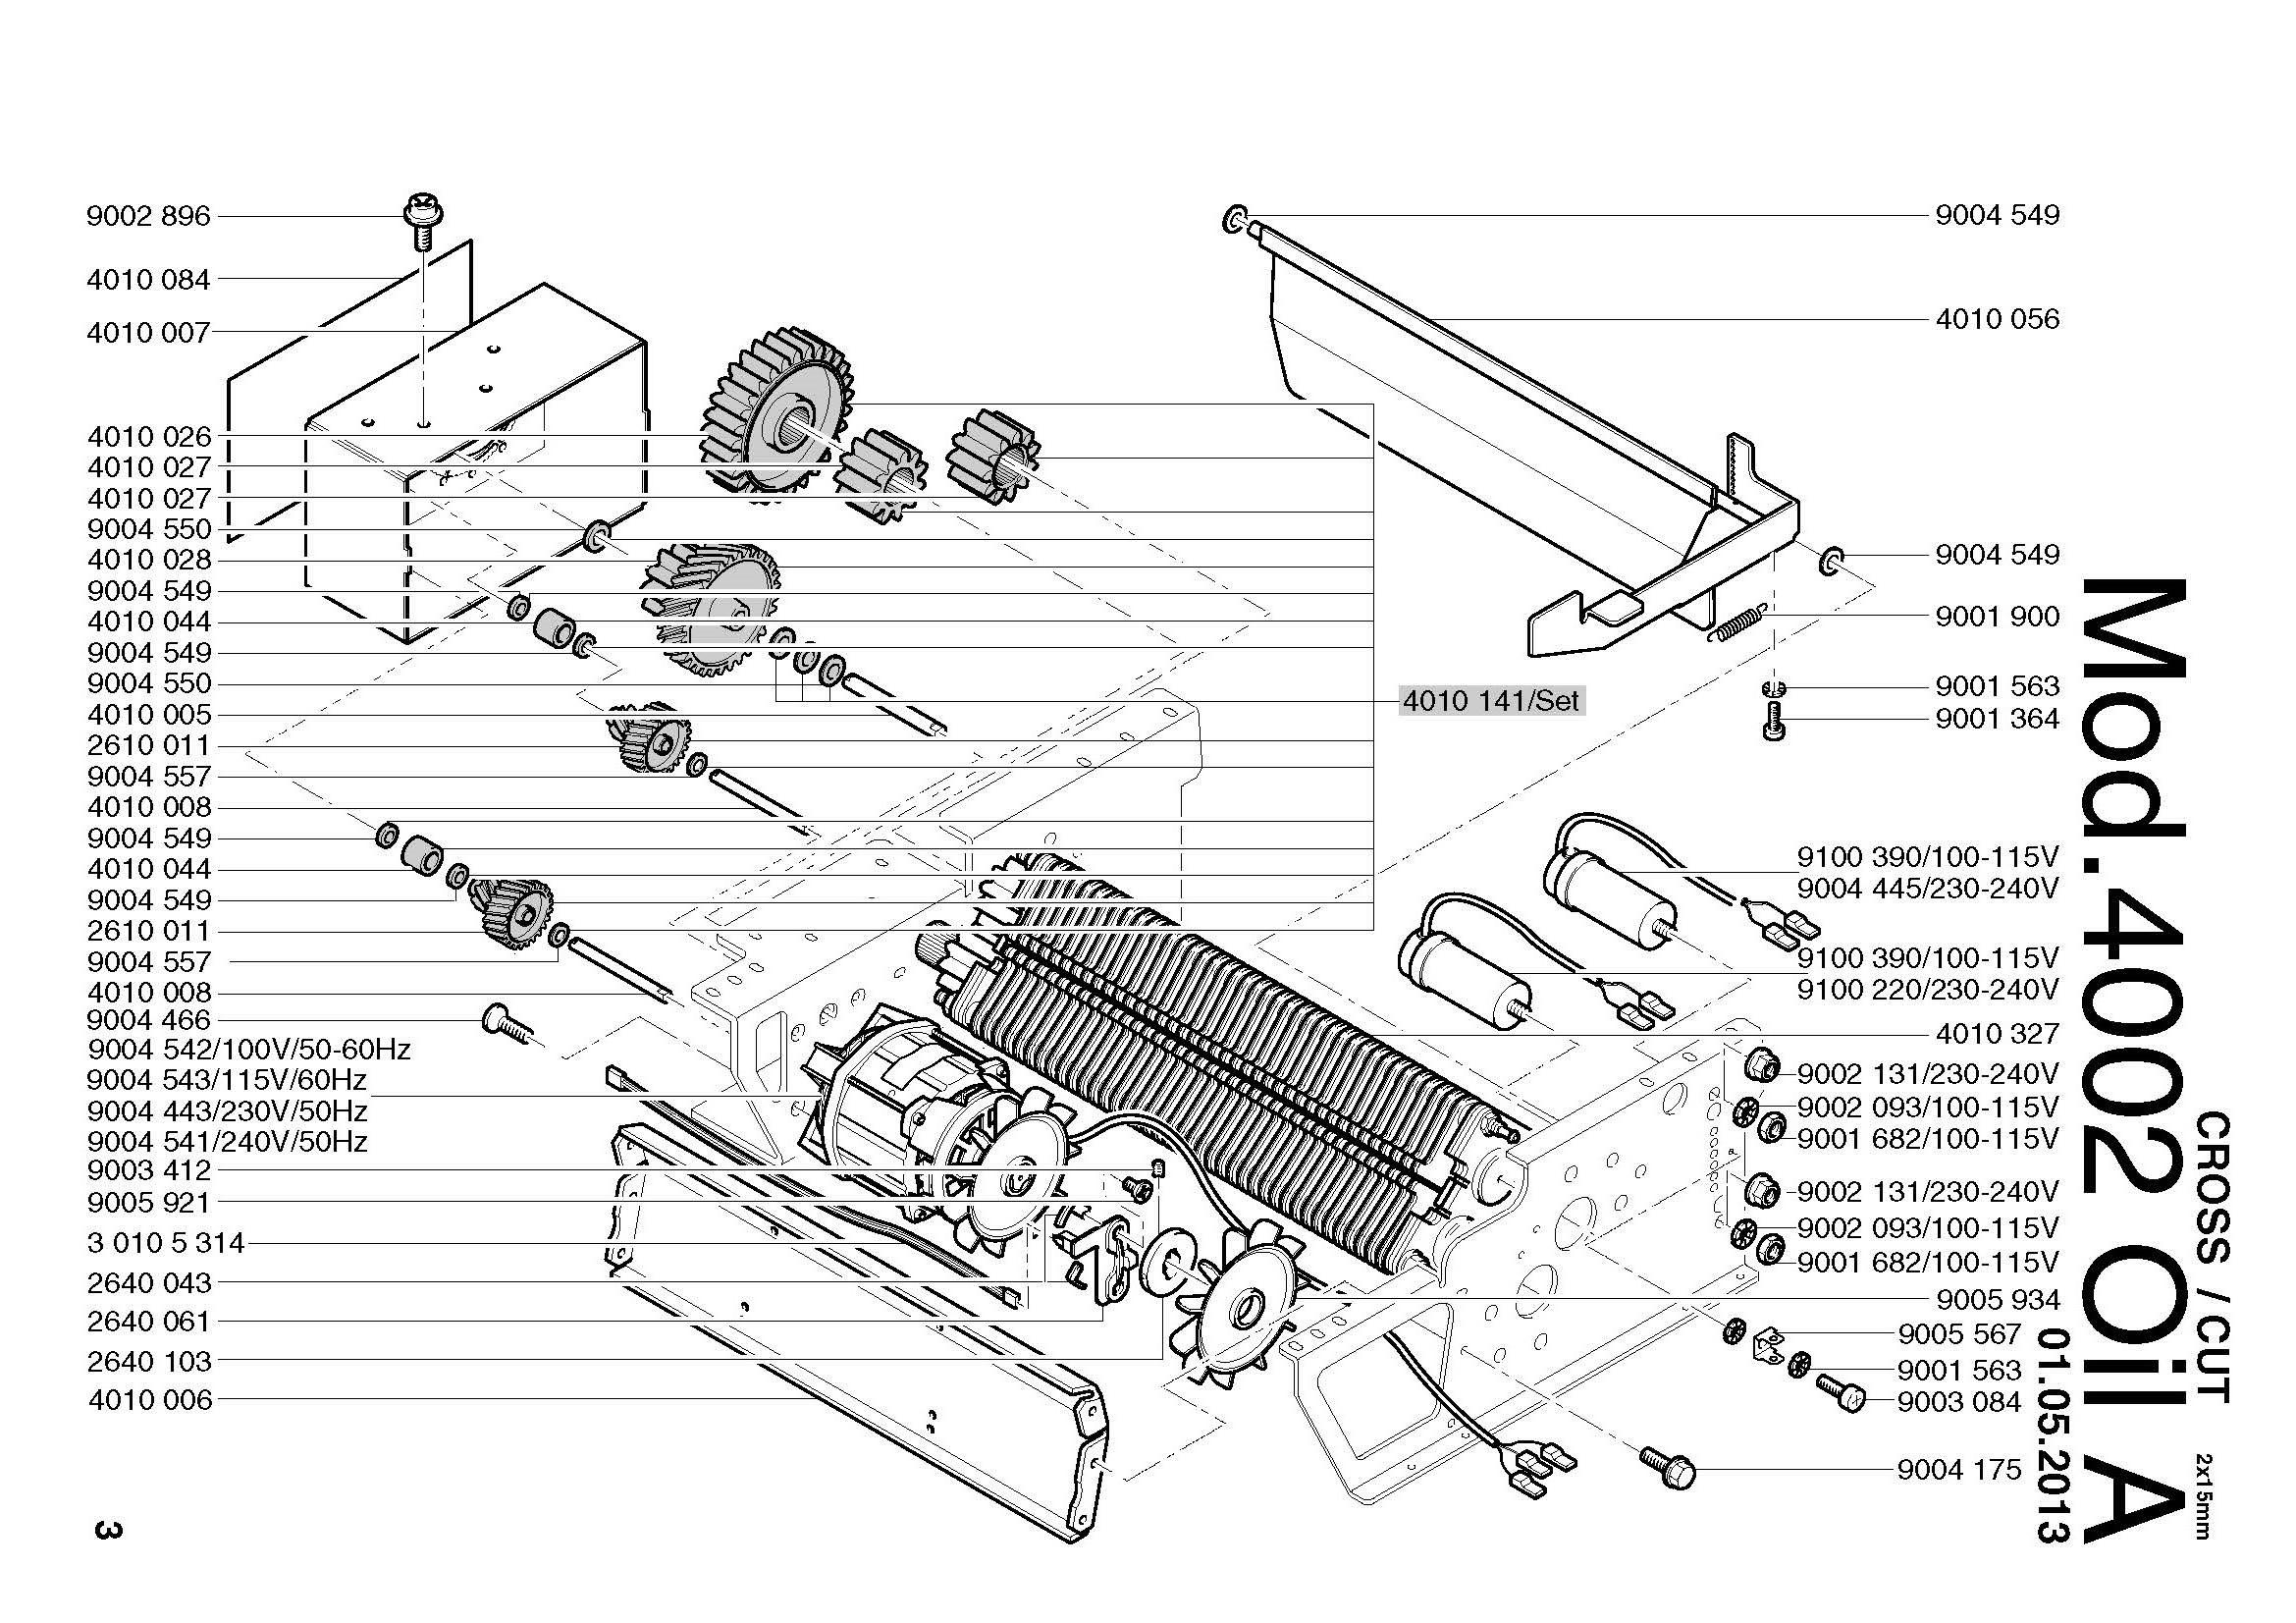 paper shredder wiring diagram wiring library aurora paper shredder parts manual enthusiast wiring diagrams u2022 rh rasalibre co electrical schematic electronic schematics